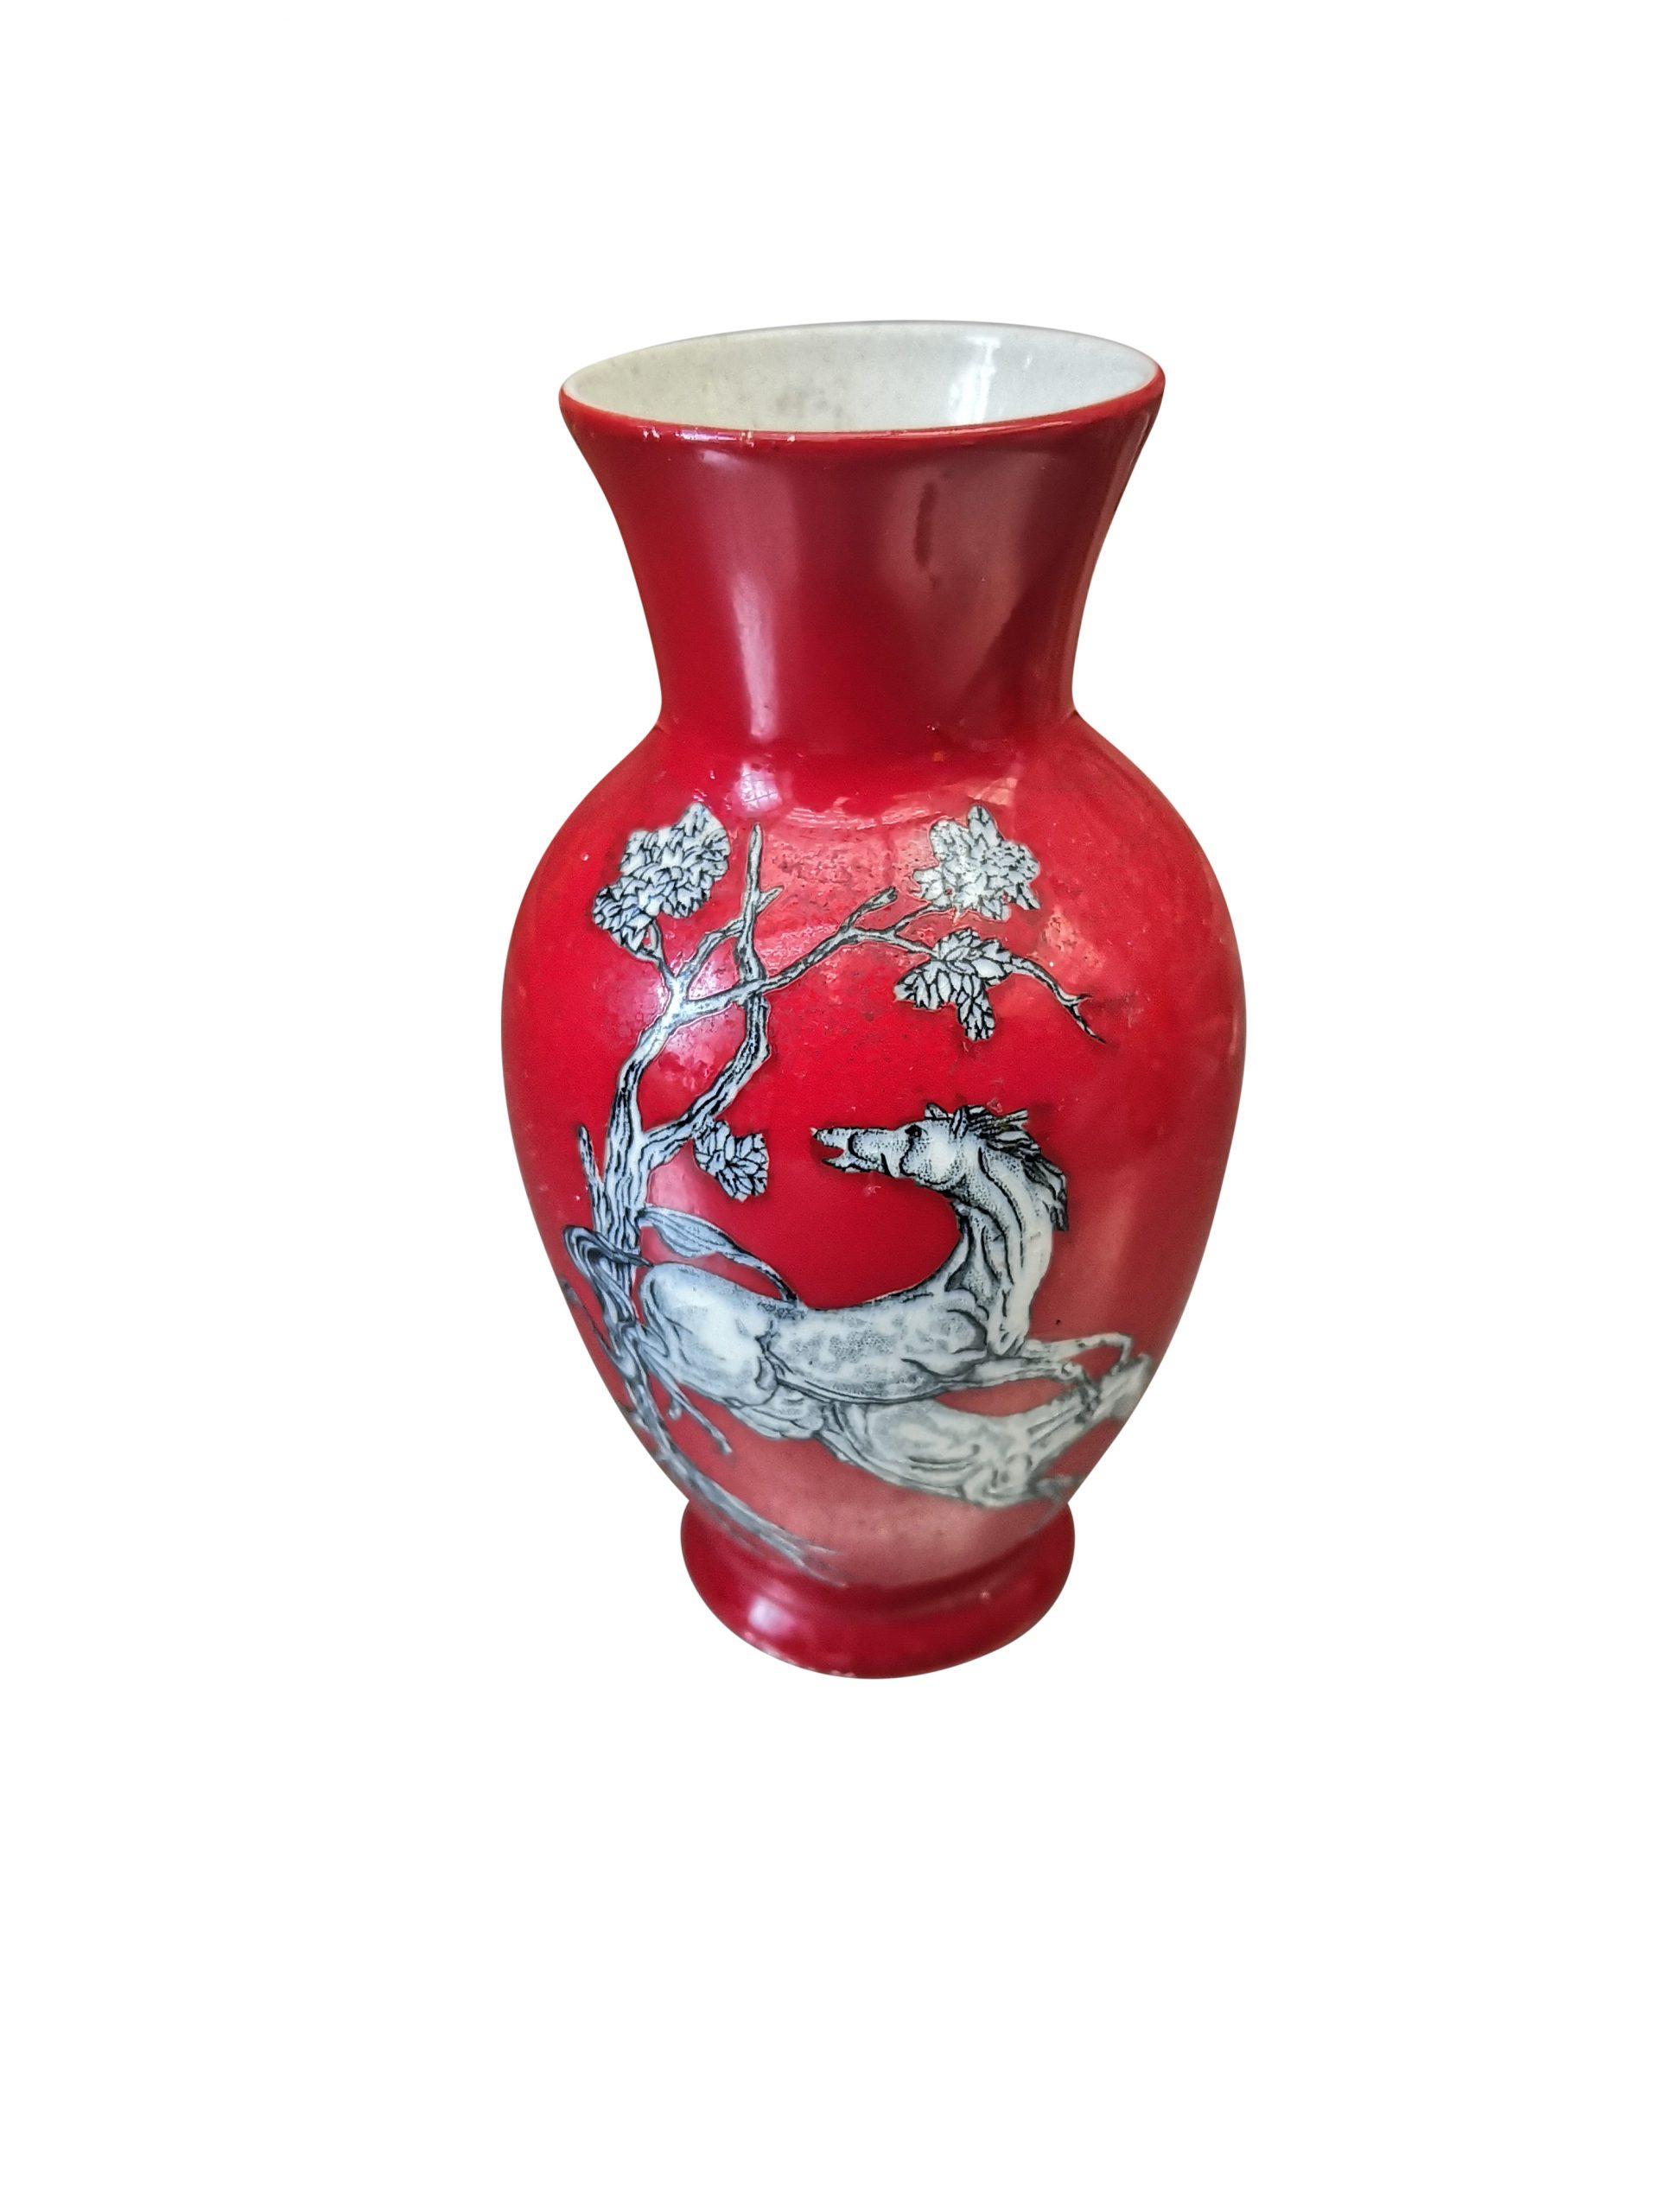 Vintage Crown Devon Fieldings small red pegasus vase - Antik Seramika vintage pottery